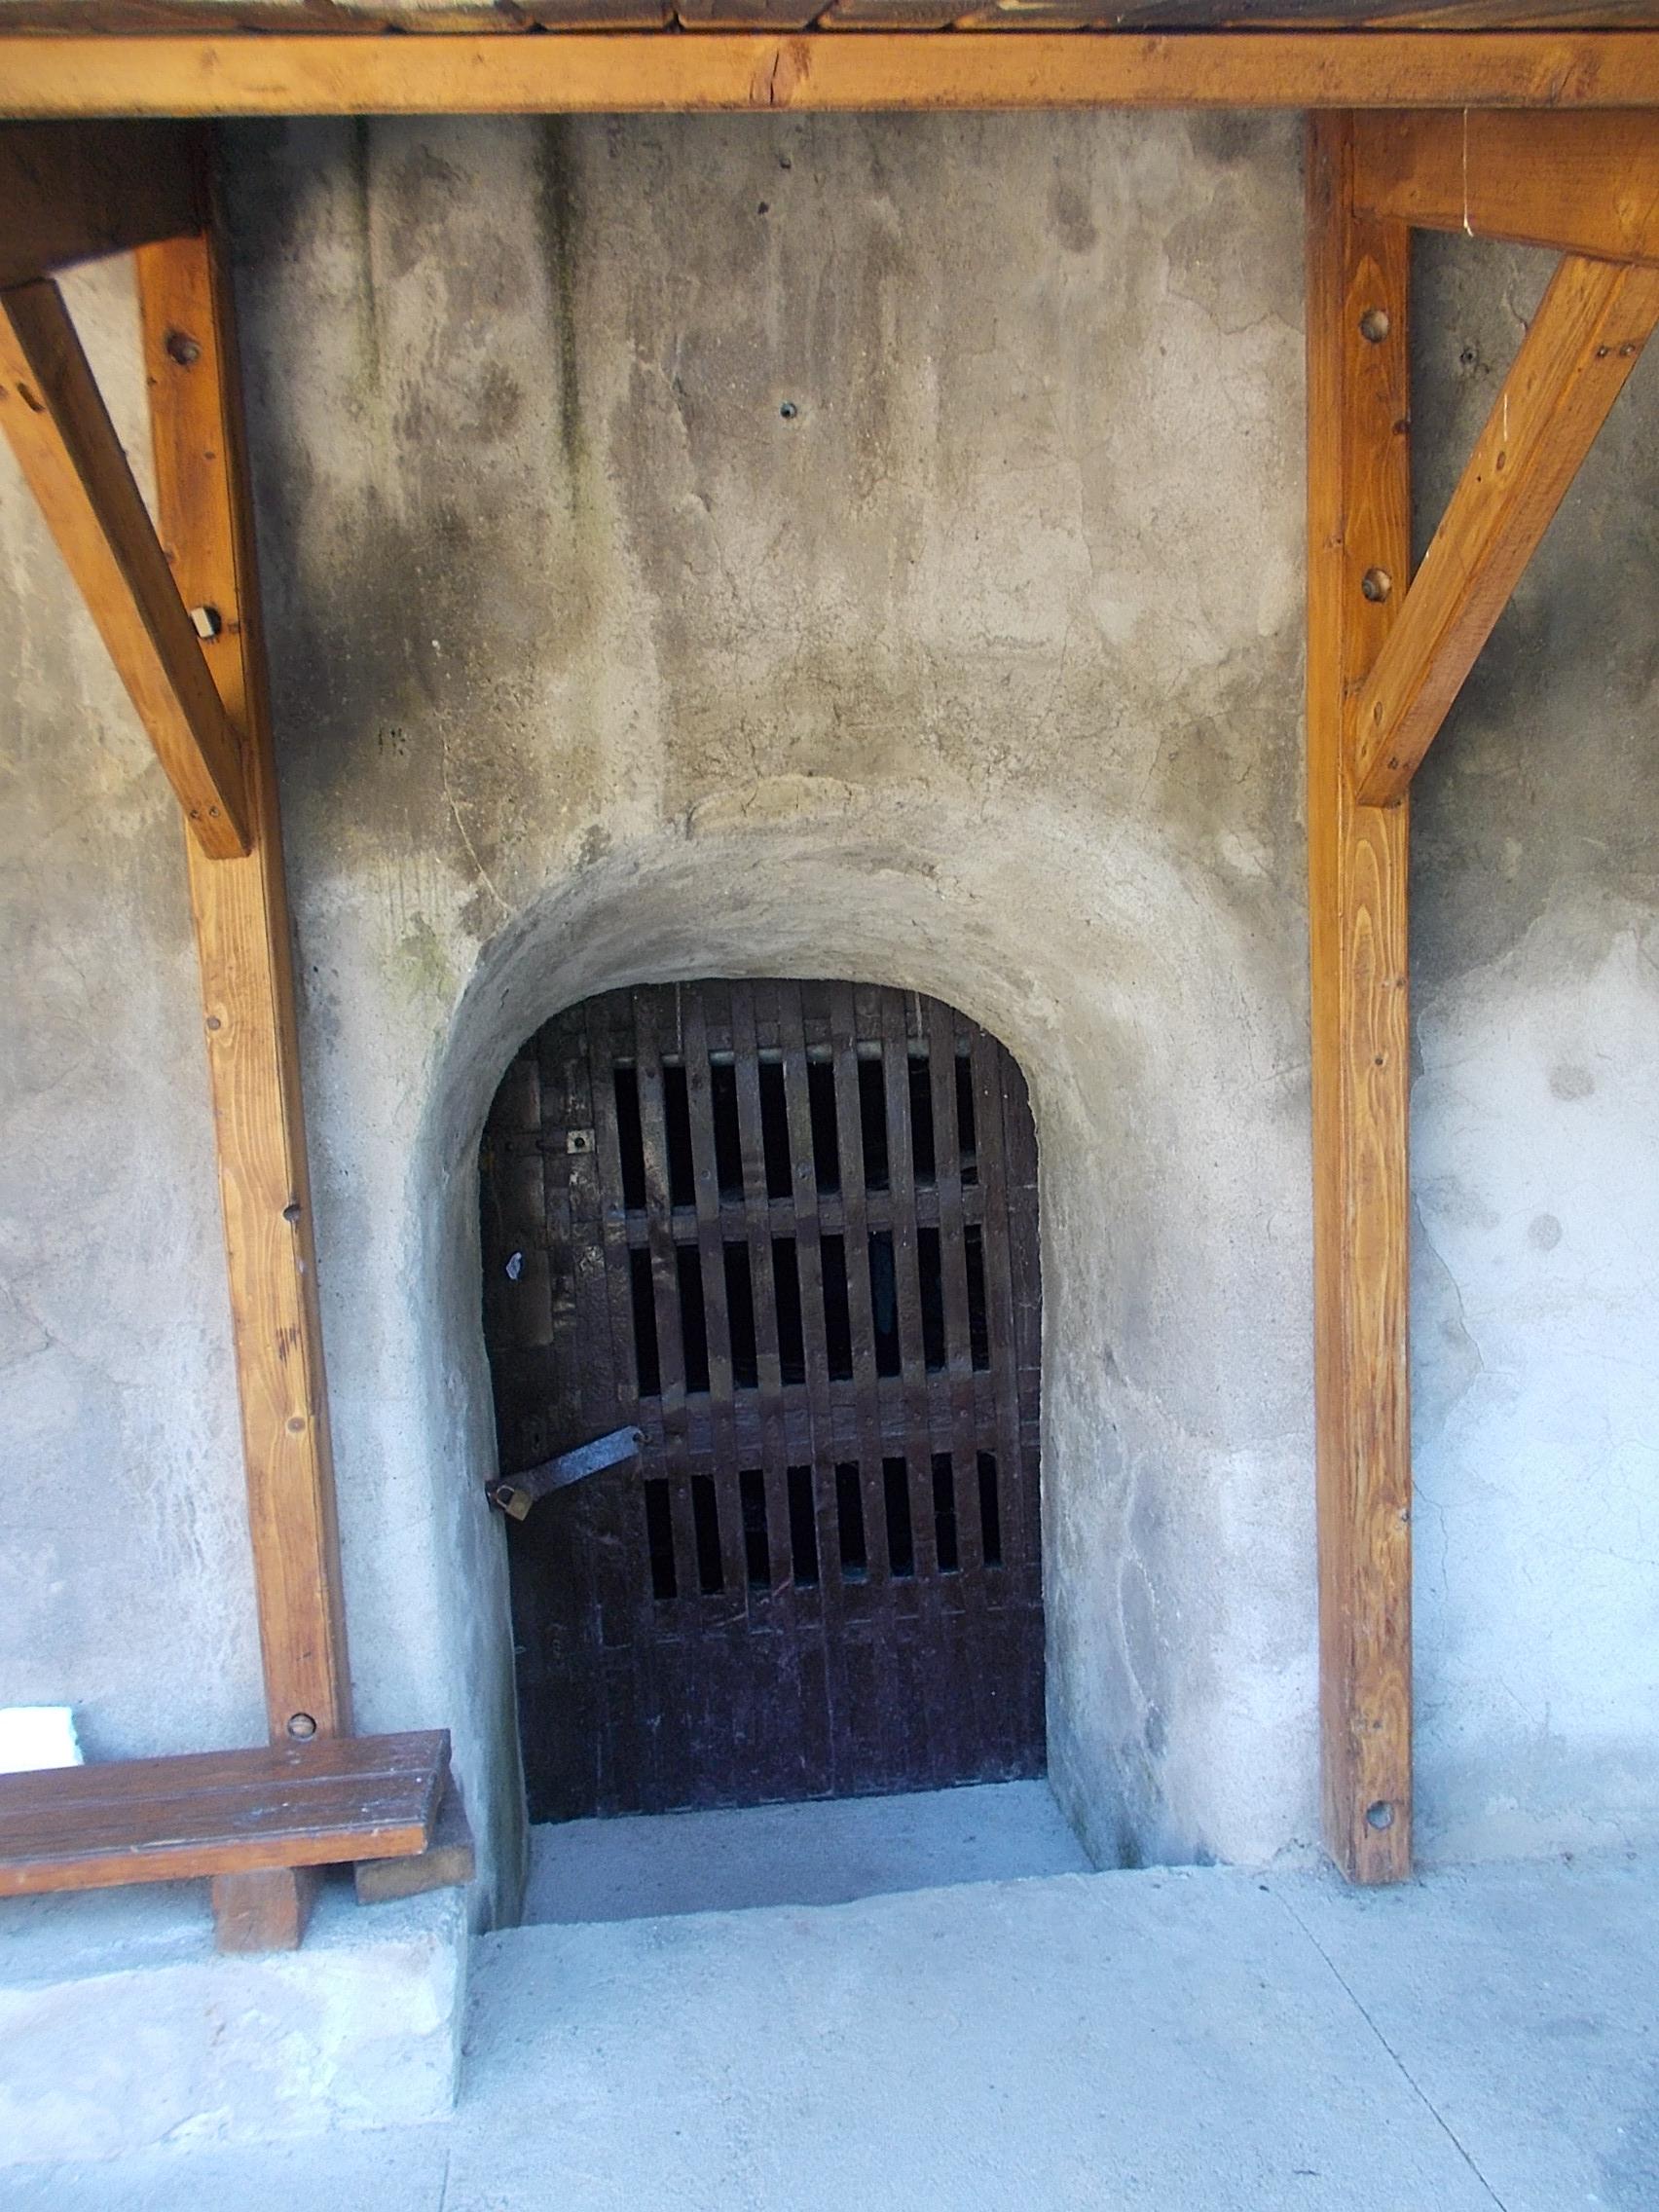 FileRózsa völgy wine cellar barred door in Eger 2016 Hungary.jpg & File:Rózsa völgy wine cellar barred door in Eger 2016 Hungary.jpg ...